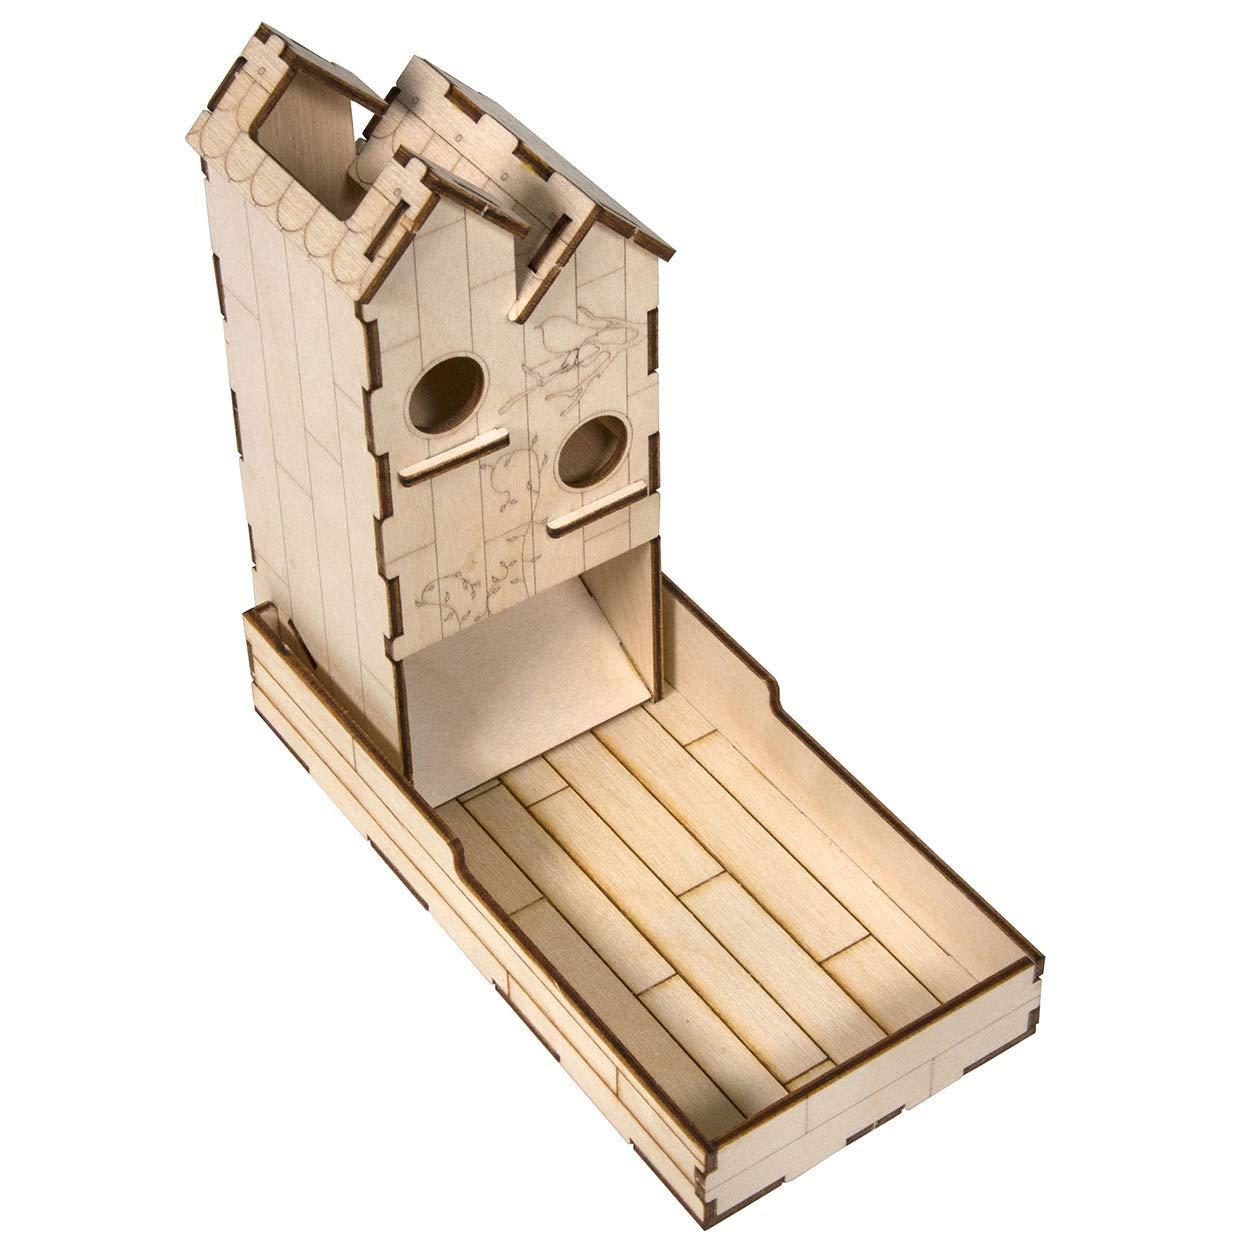 The Broken Token Mini Dice Tower Kit - Birdhouse by The Broken Token